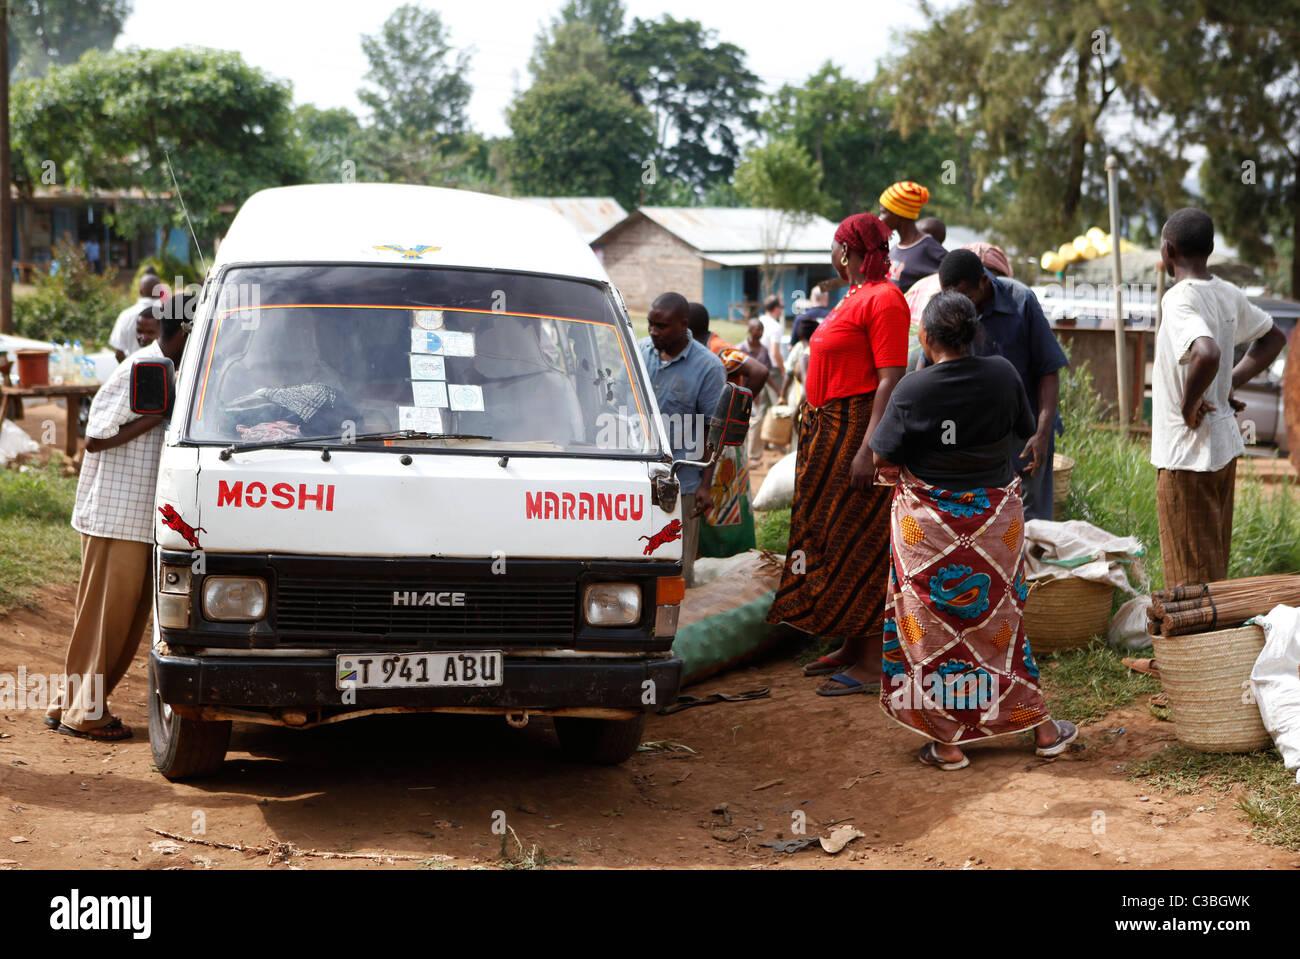 Minibus service to Moshi, Marangu village, Kilimanjaro National Park, Tanzania, East Africa, Africa - Stock Image